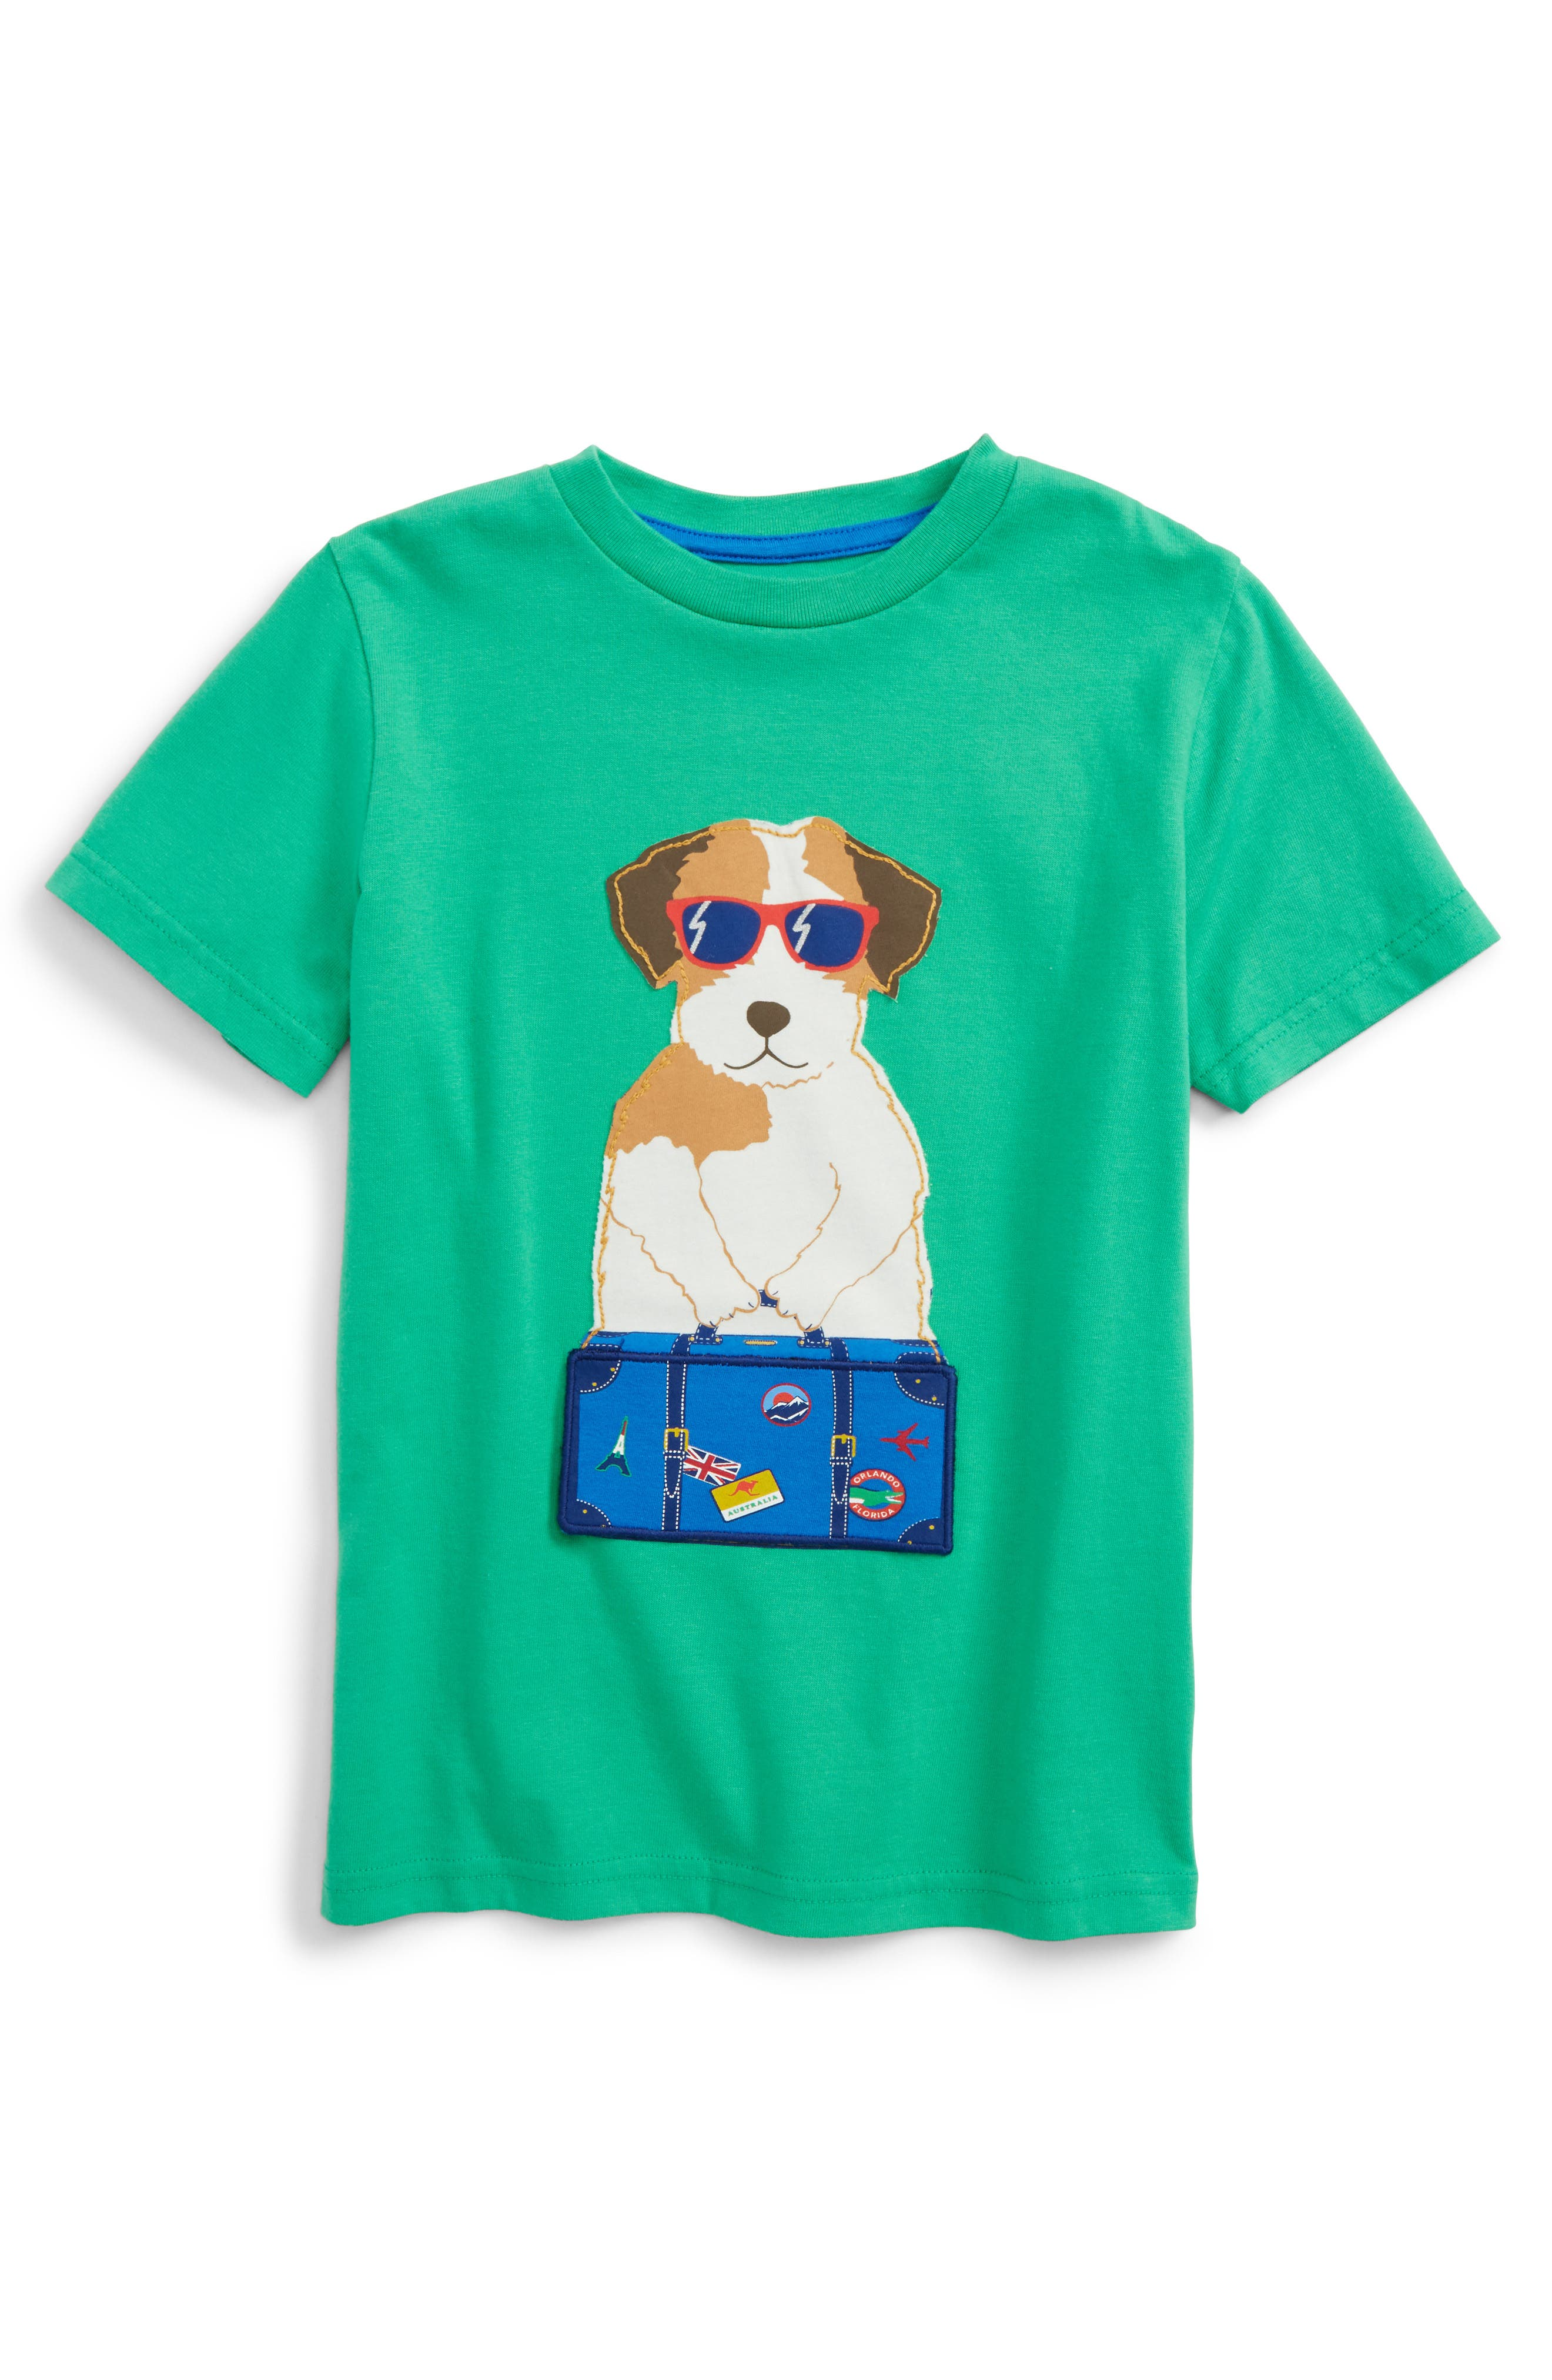 Mini boden animal appliqu t shirt for Shop mini boden